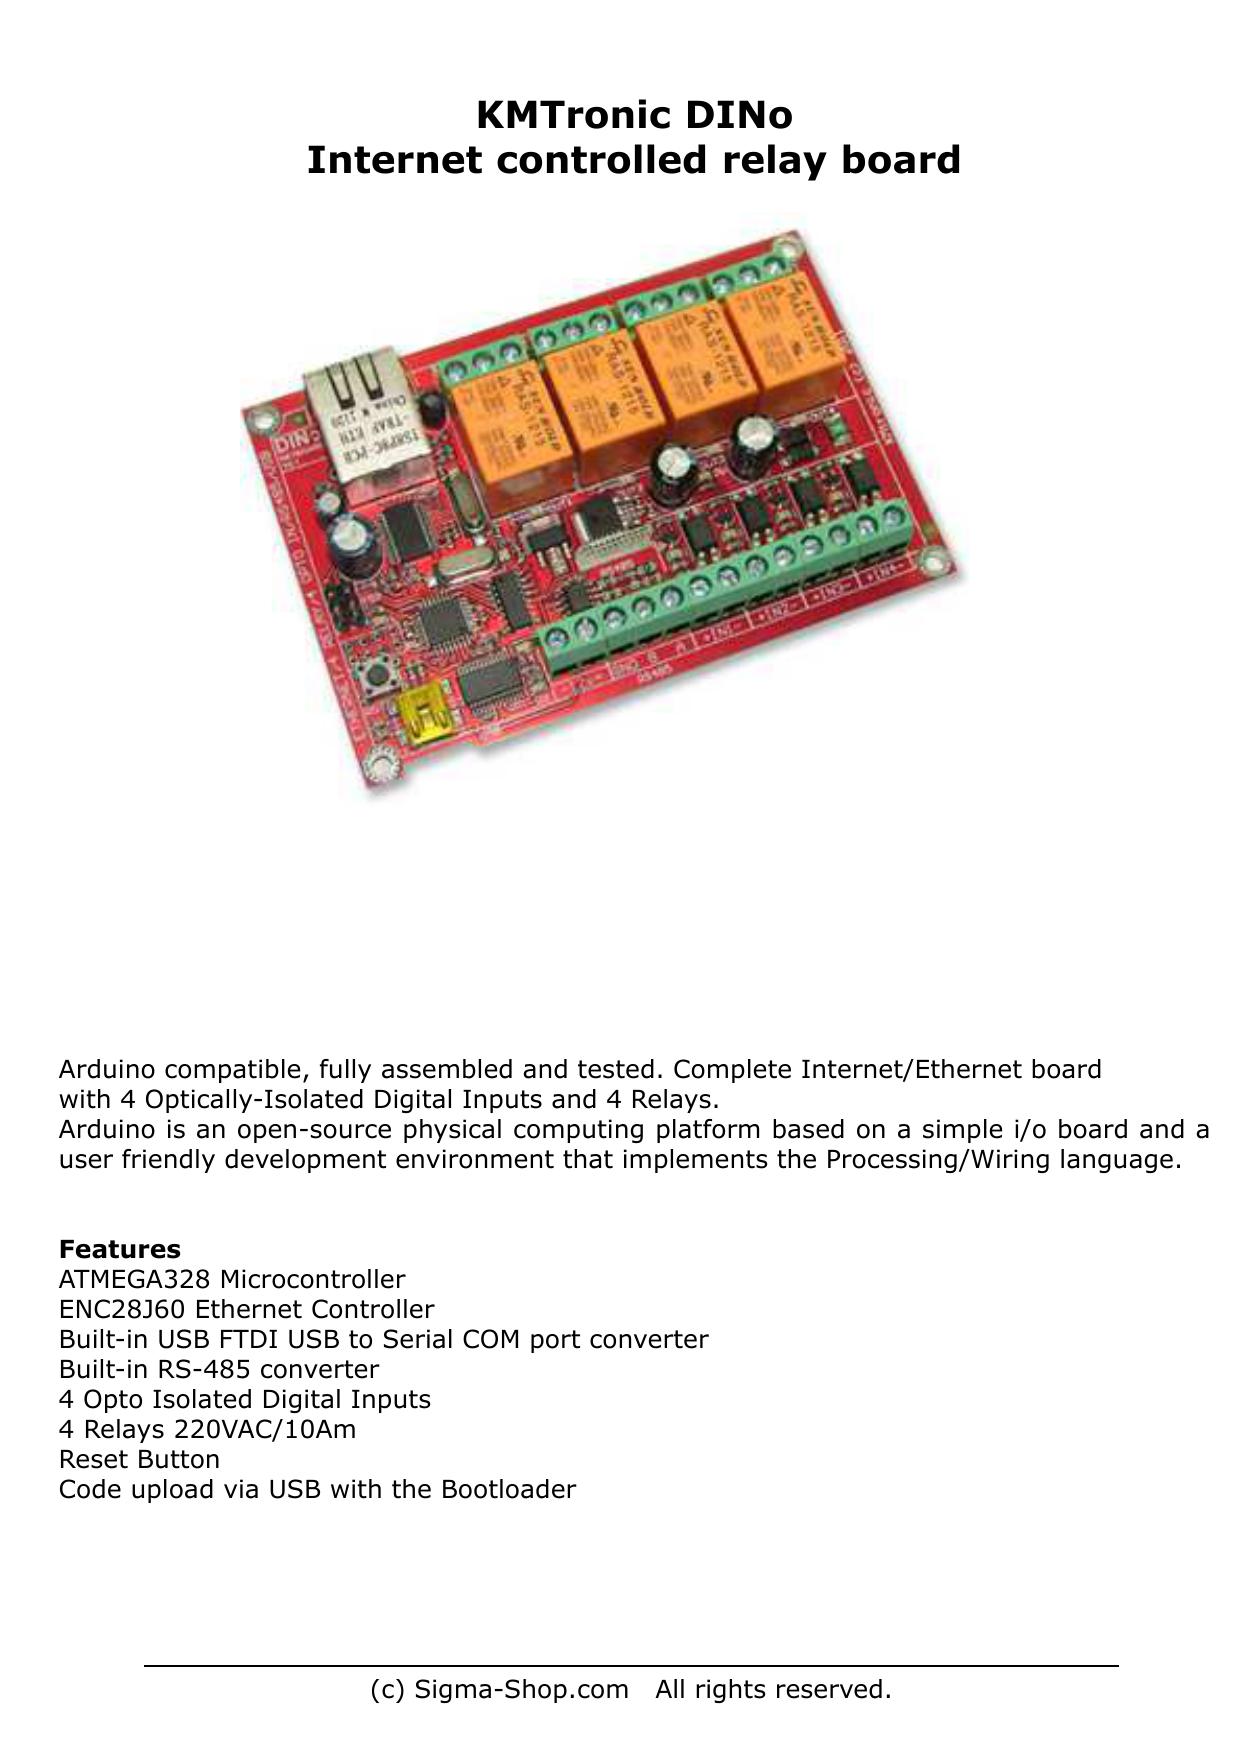 KMTronic DINo Internet controlled relay board   manualzz com